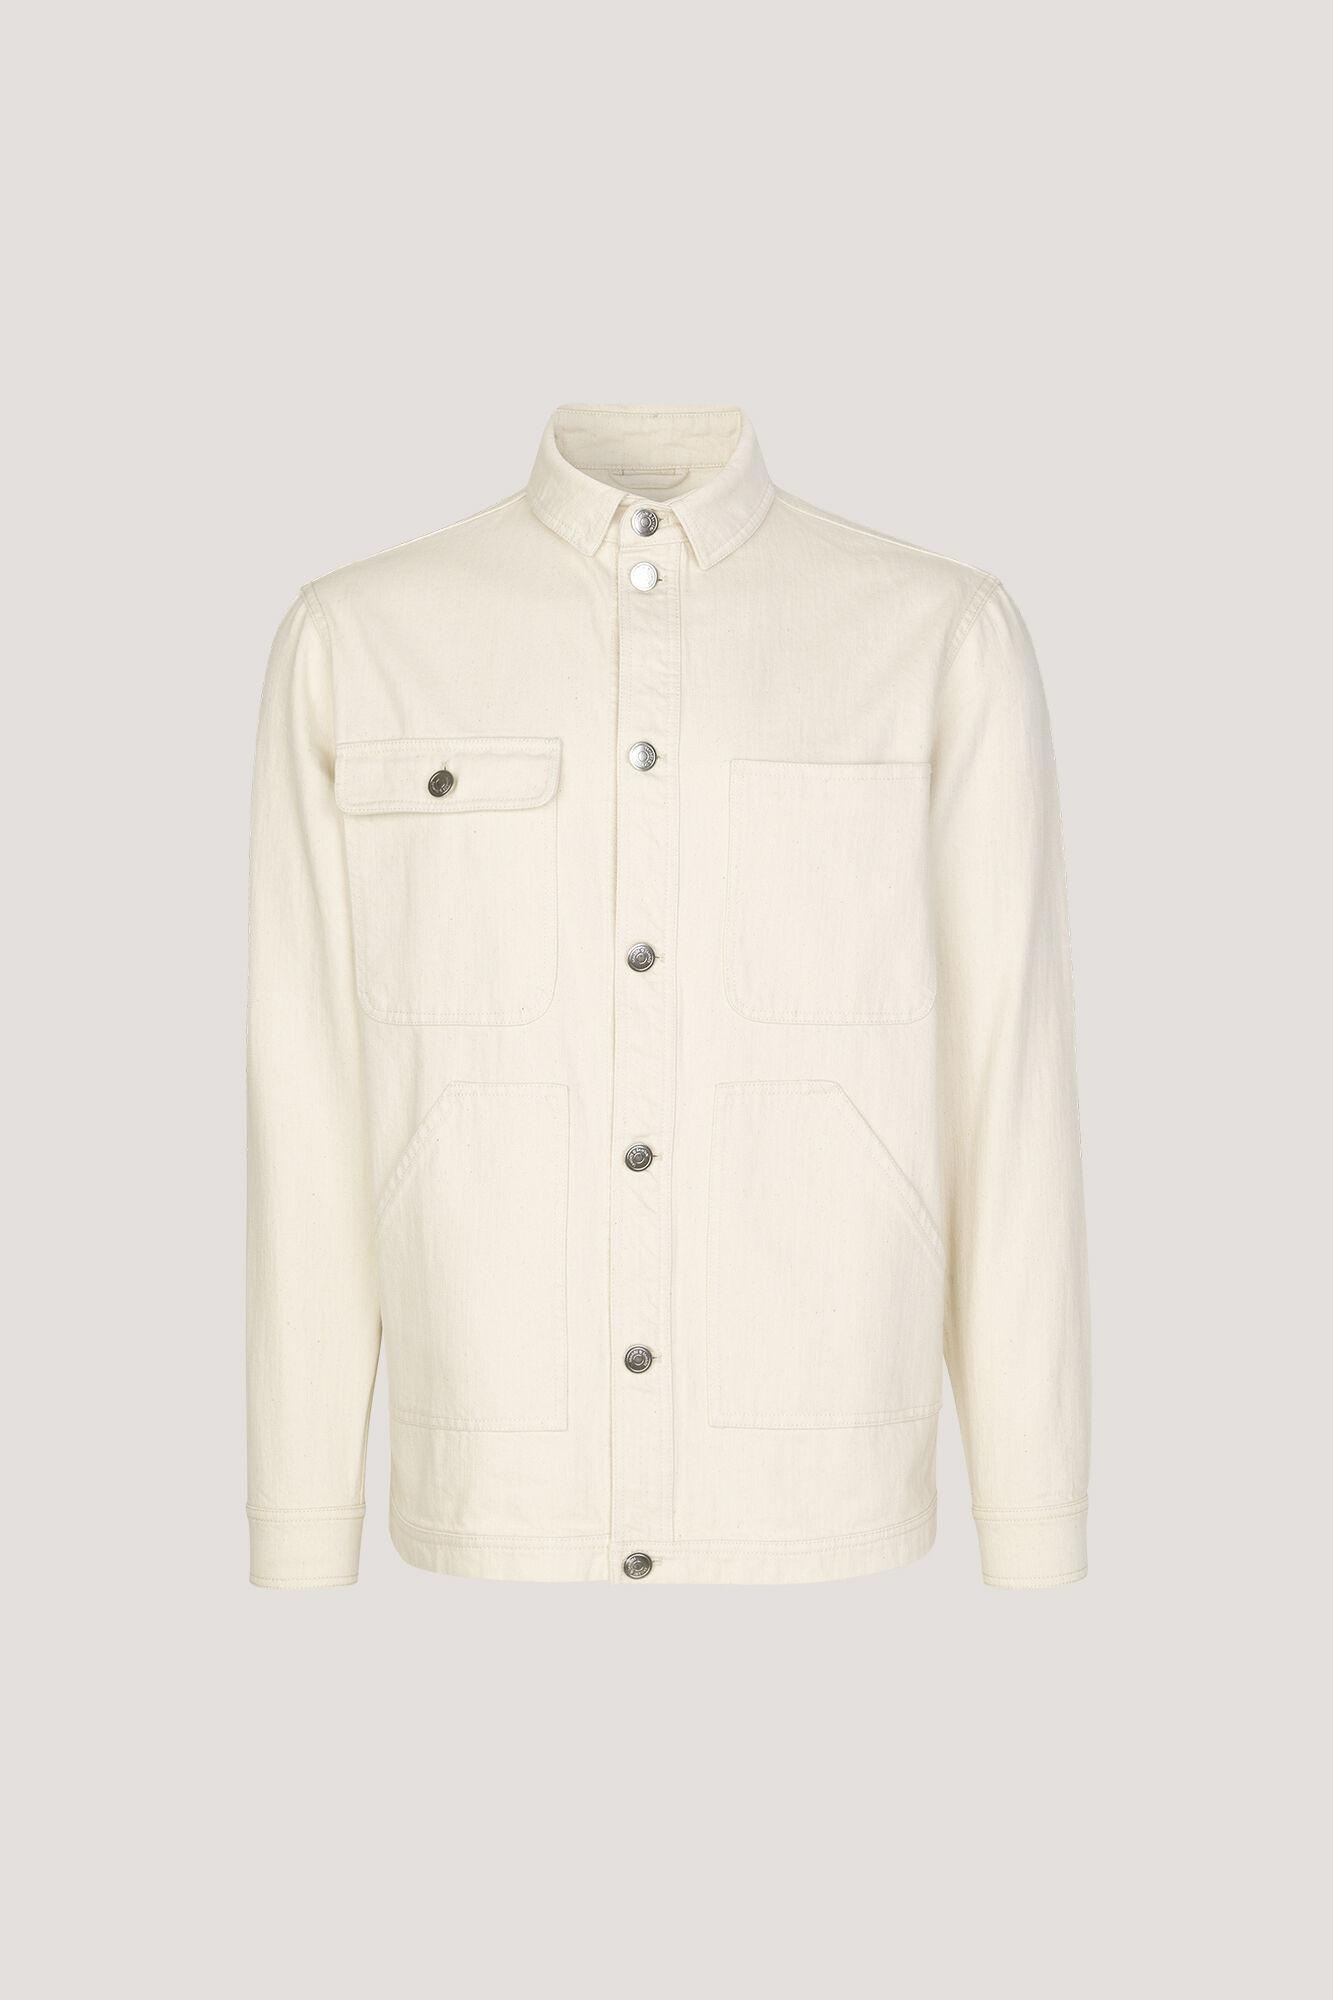 Otis jacket 10694